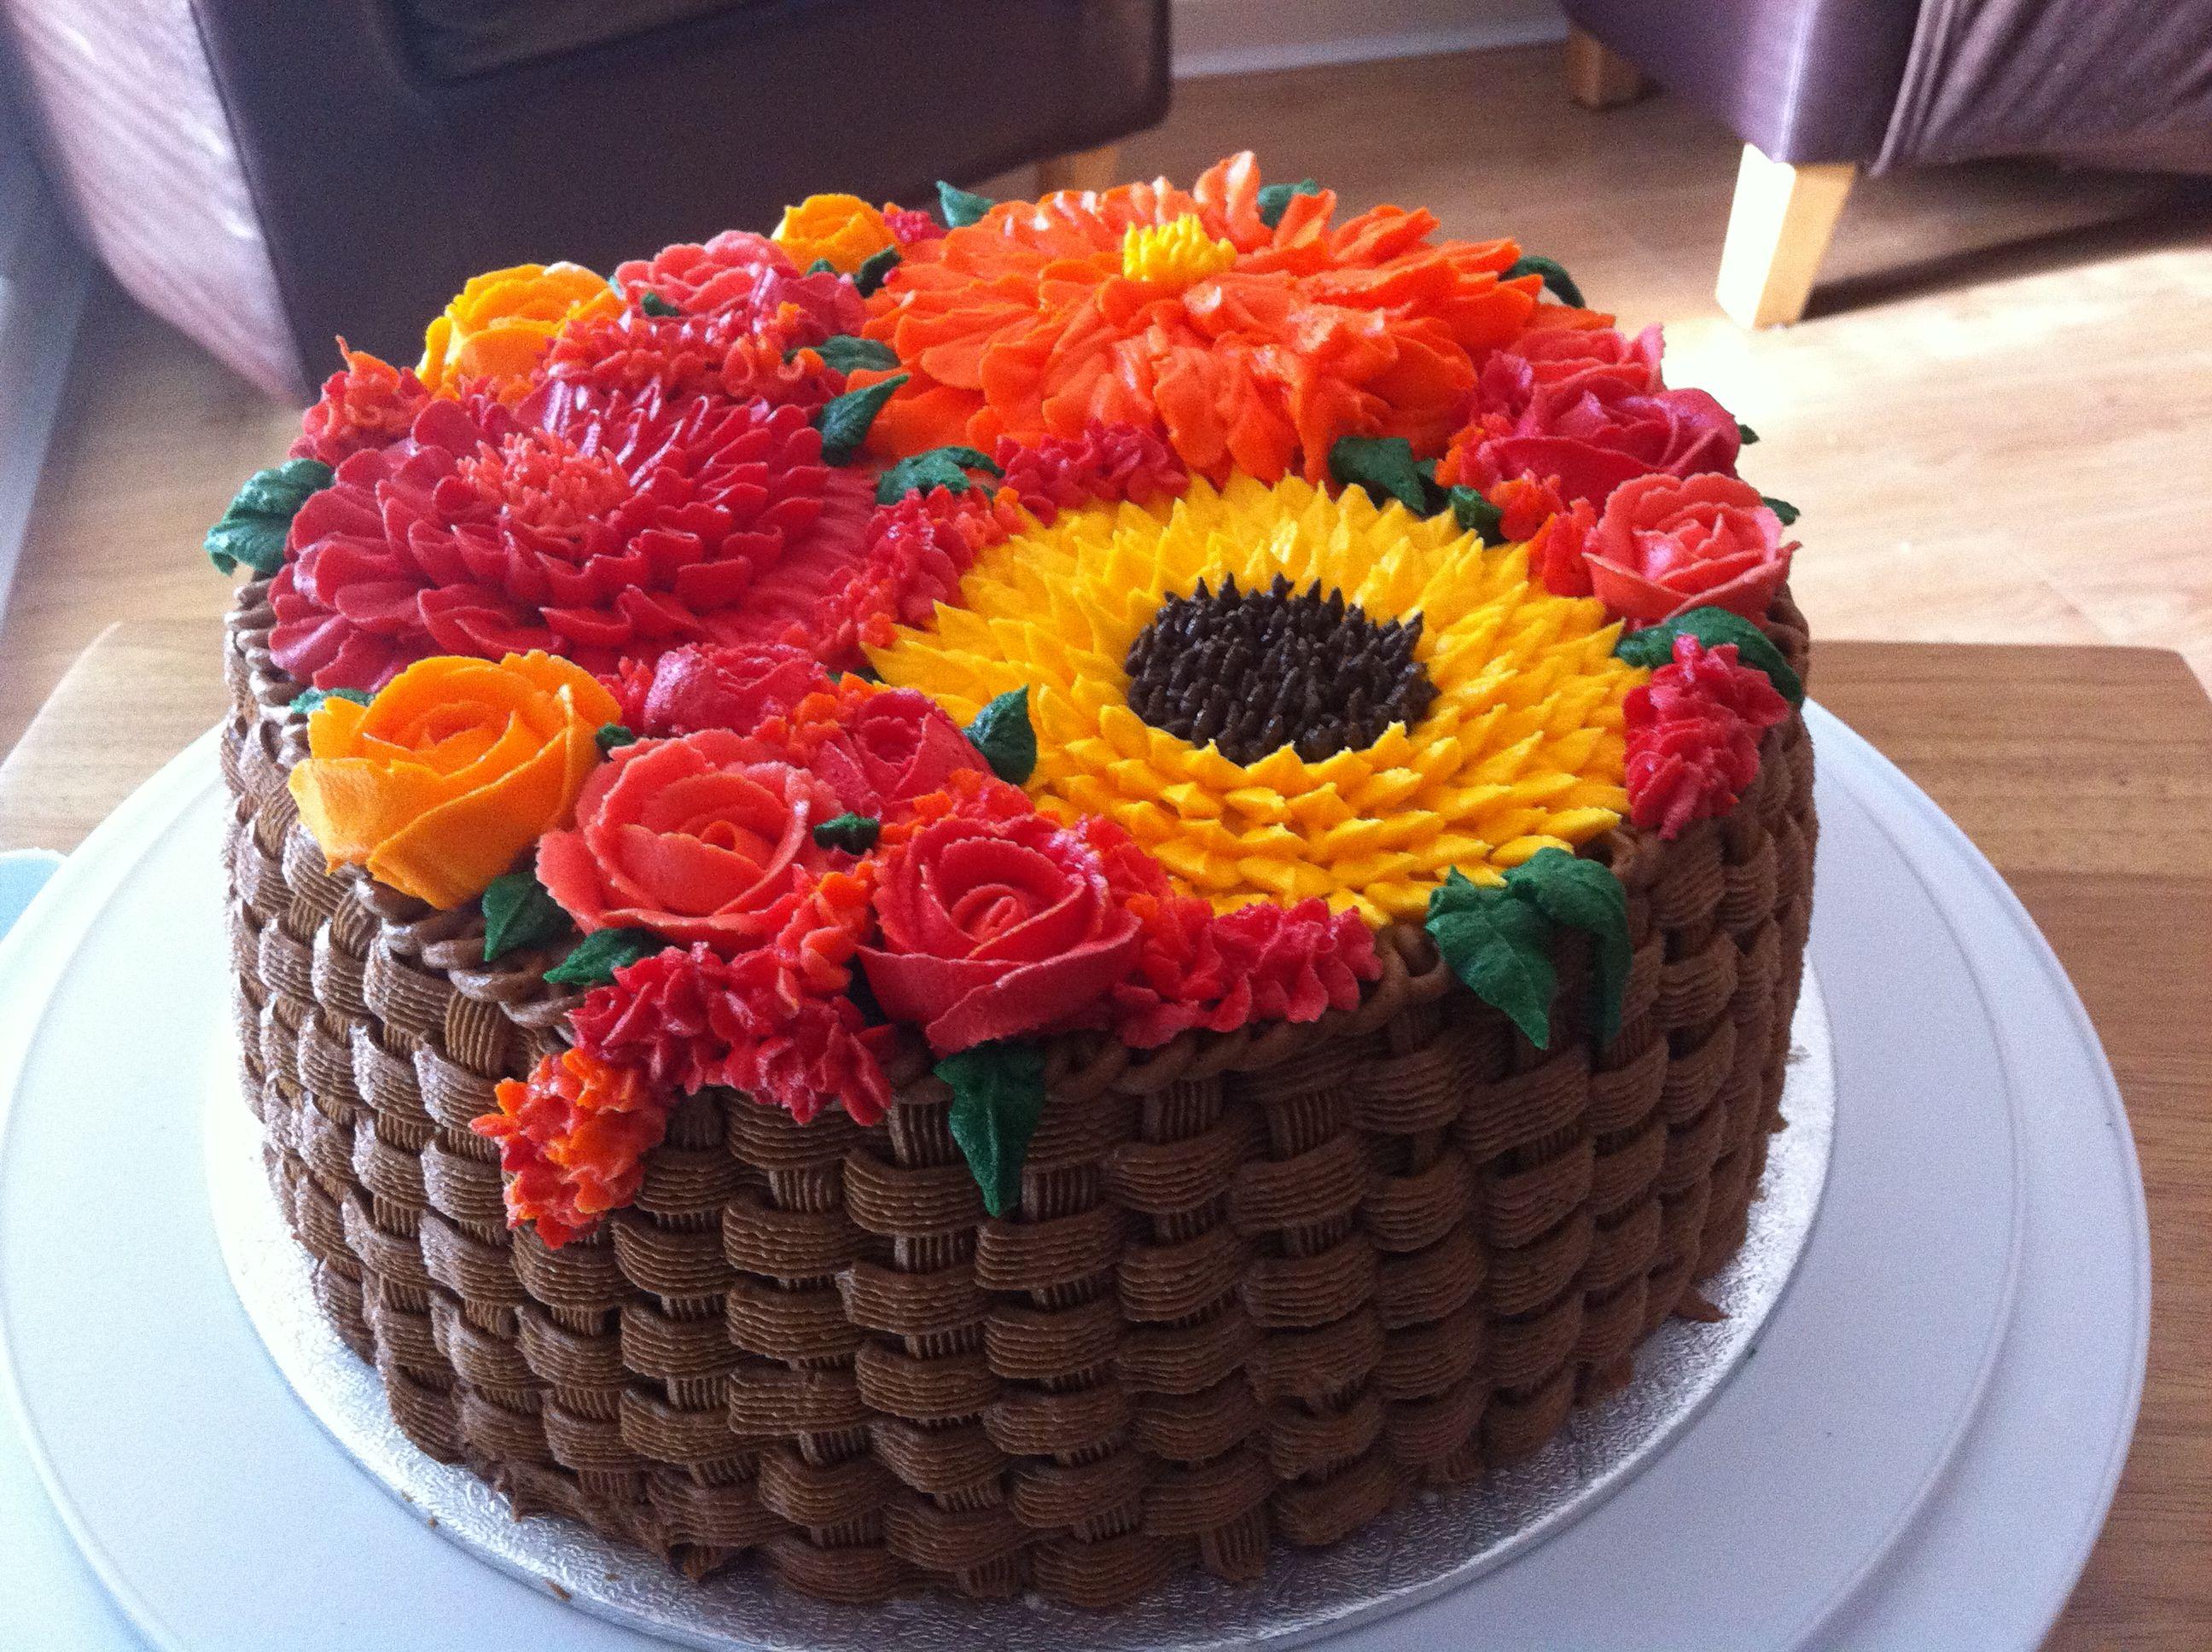 cake decorating with buttercream | Buttercream Cake ...